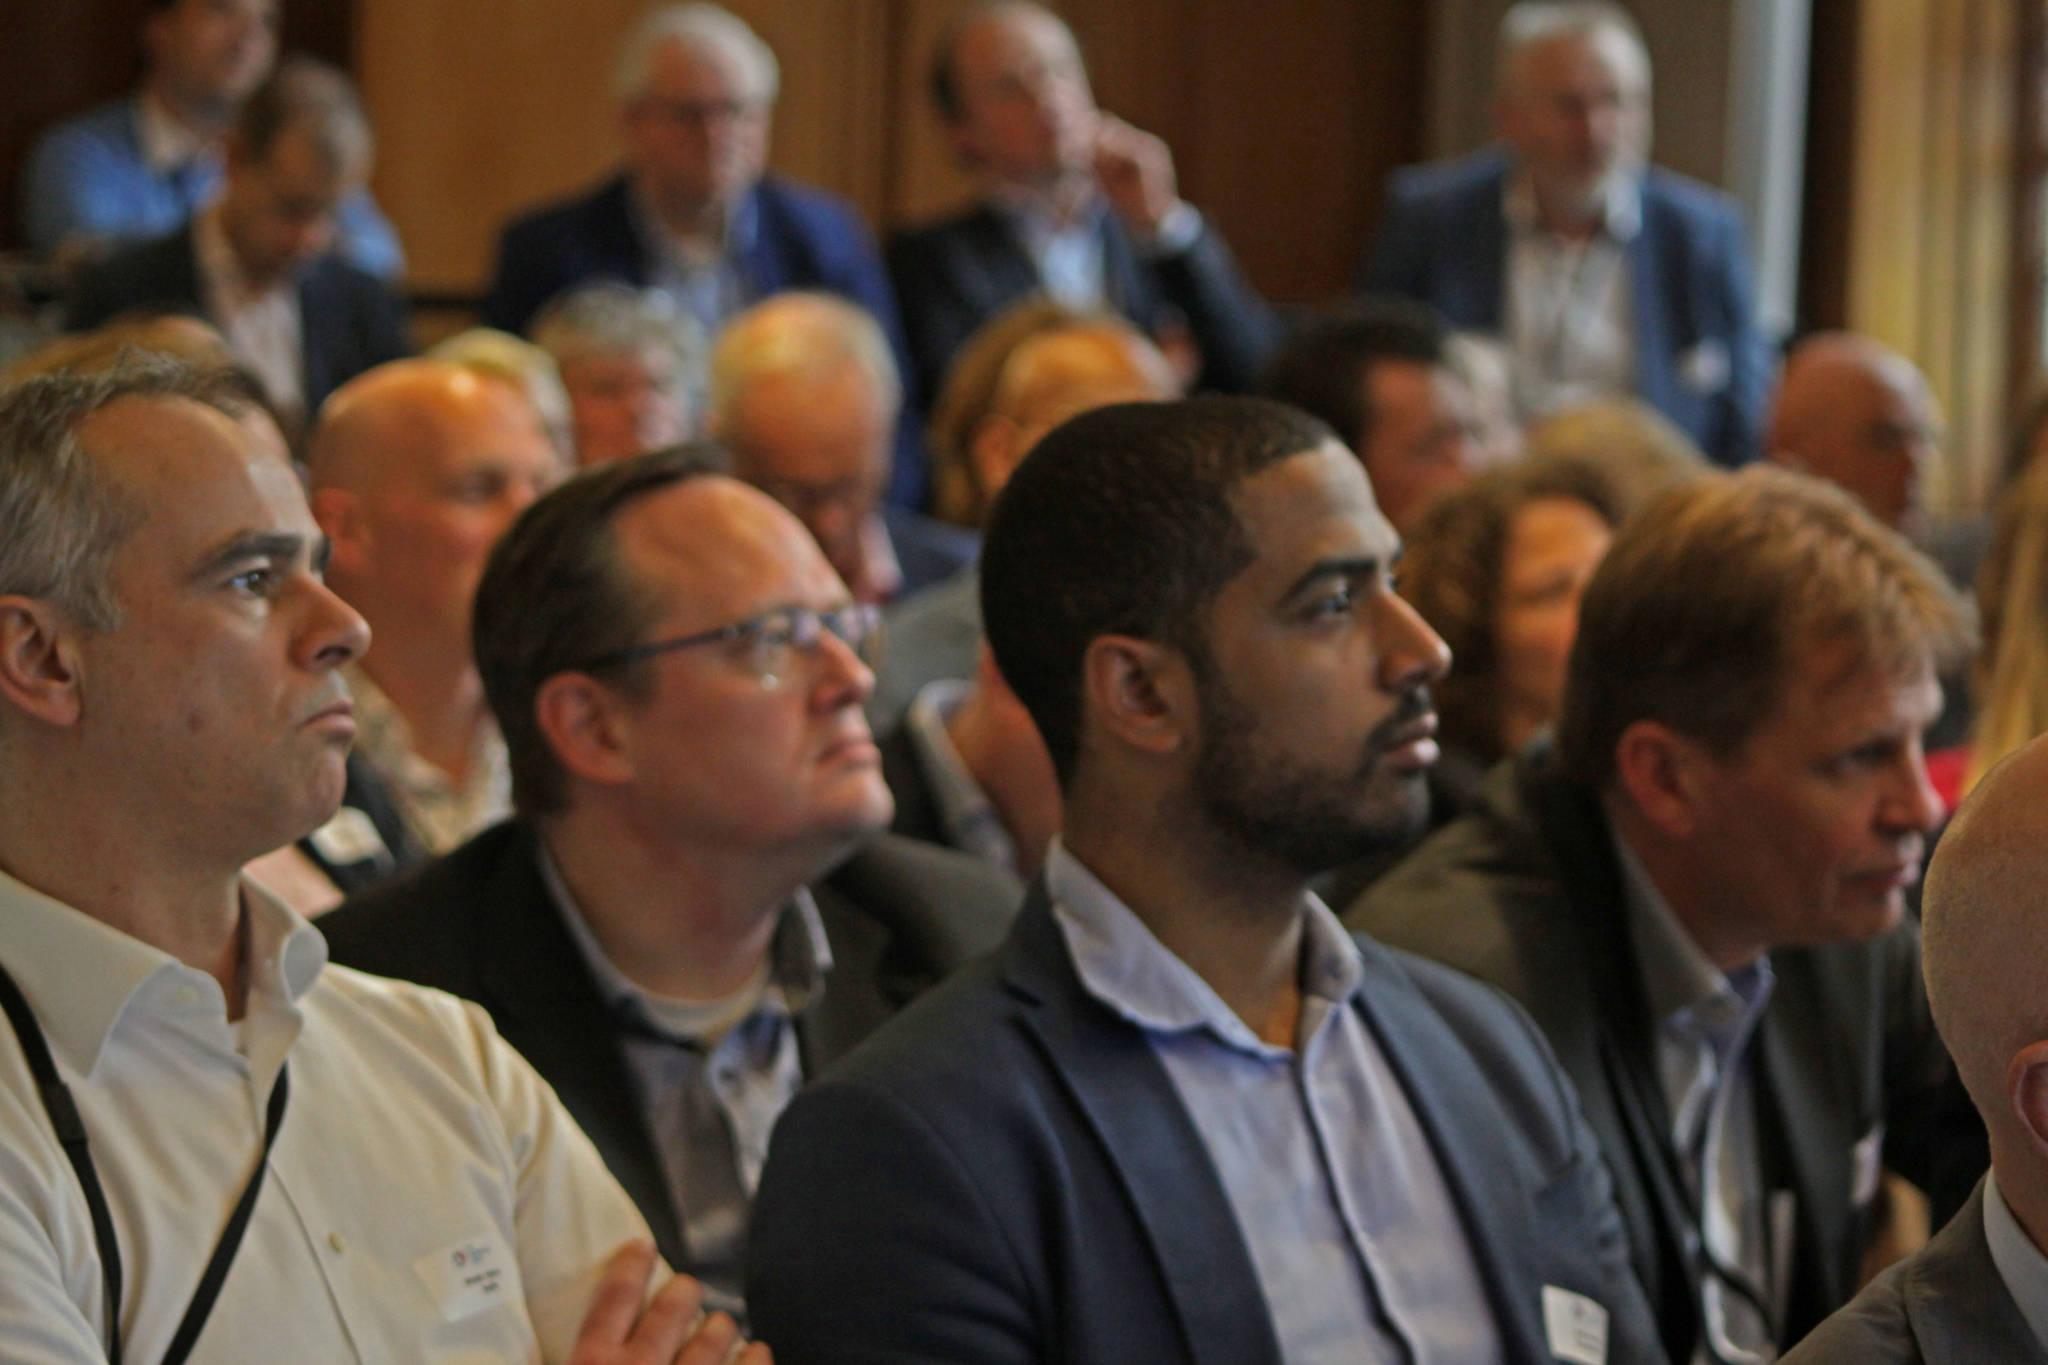 Werkconferentie met wethouders